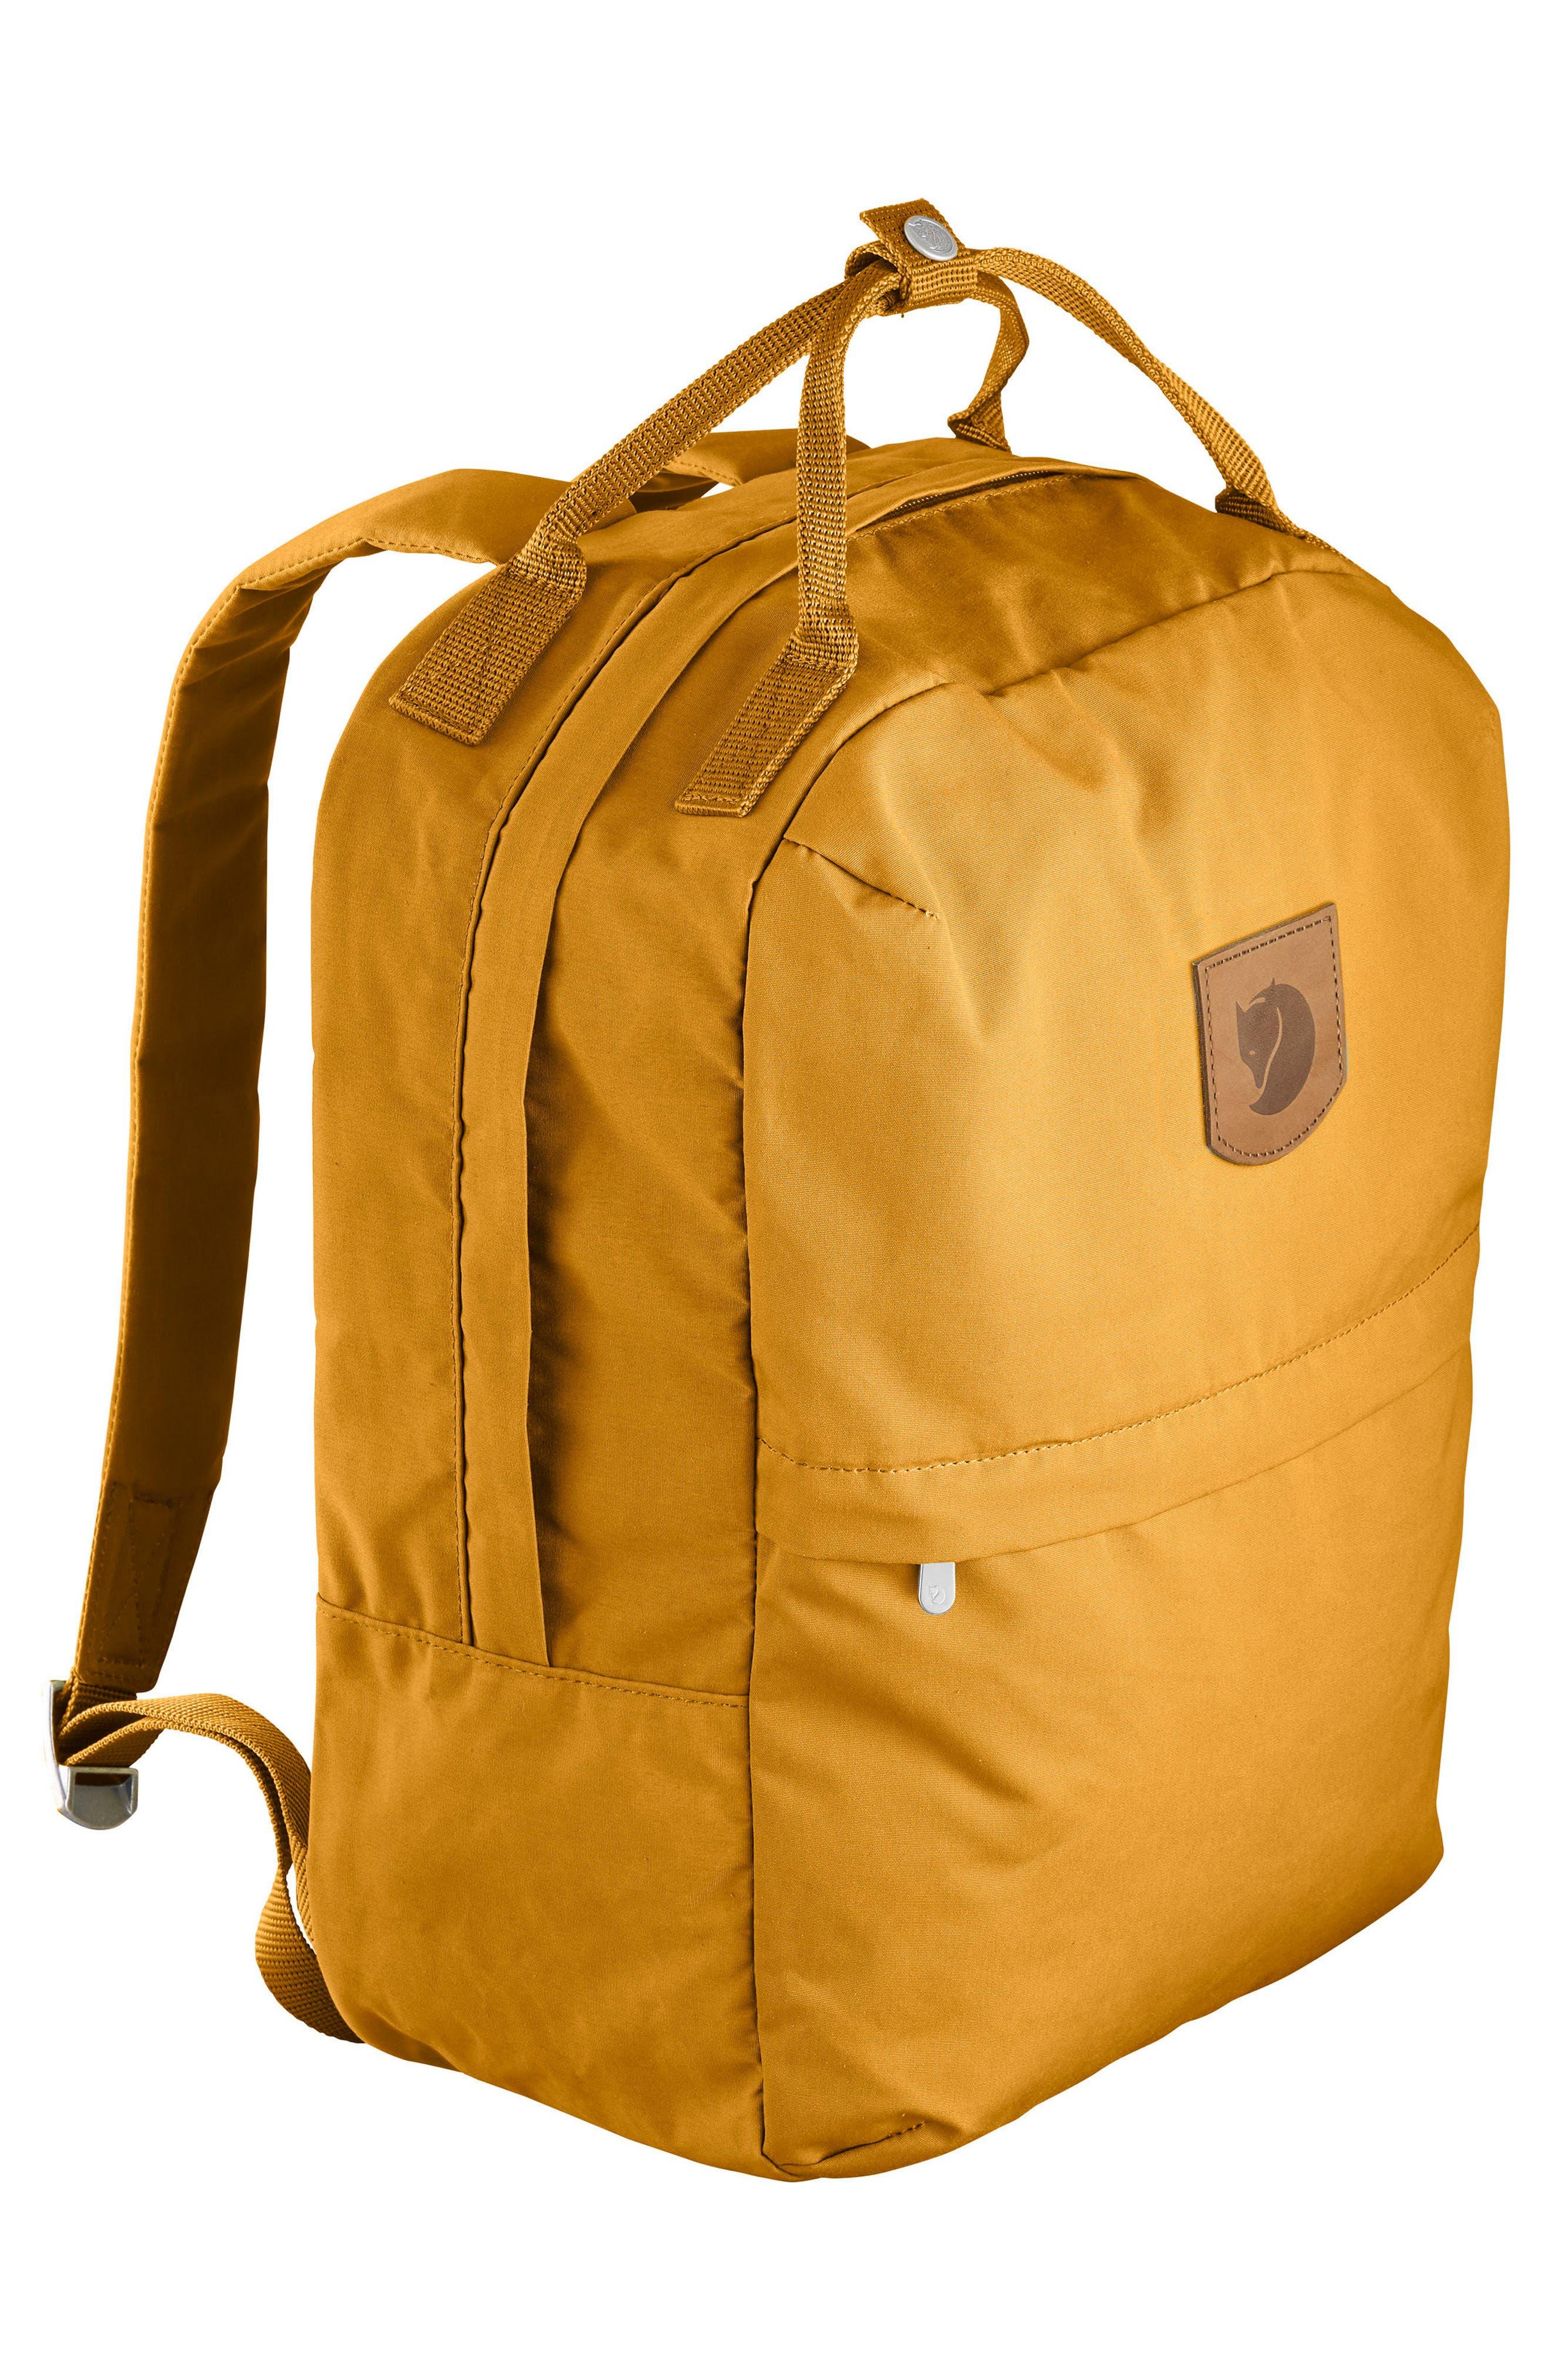 Greenland Backpack,                             Alternate thumbnail 3, color,                             Dandelion